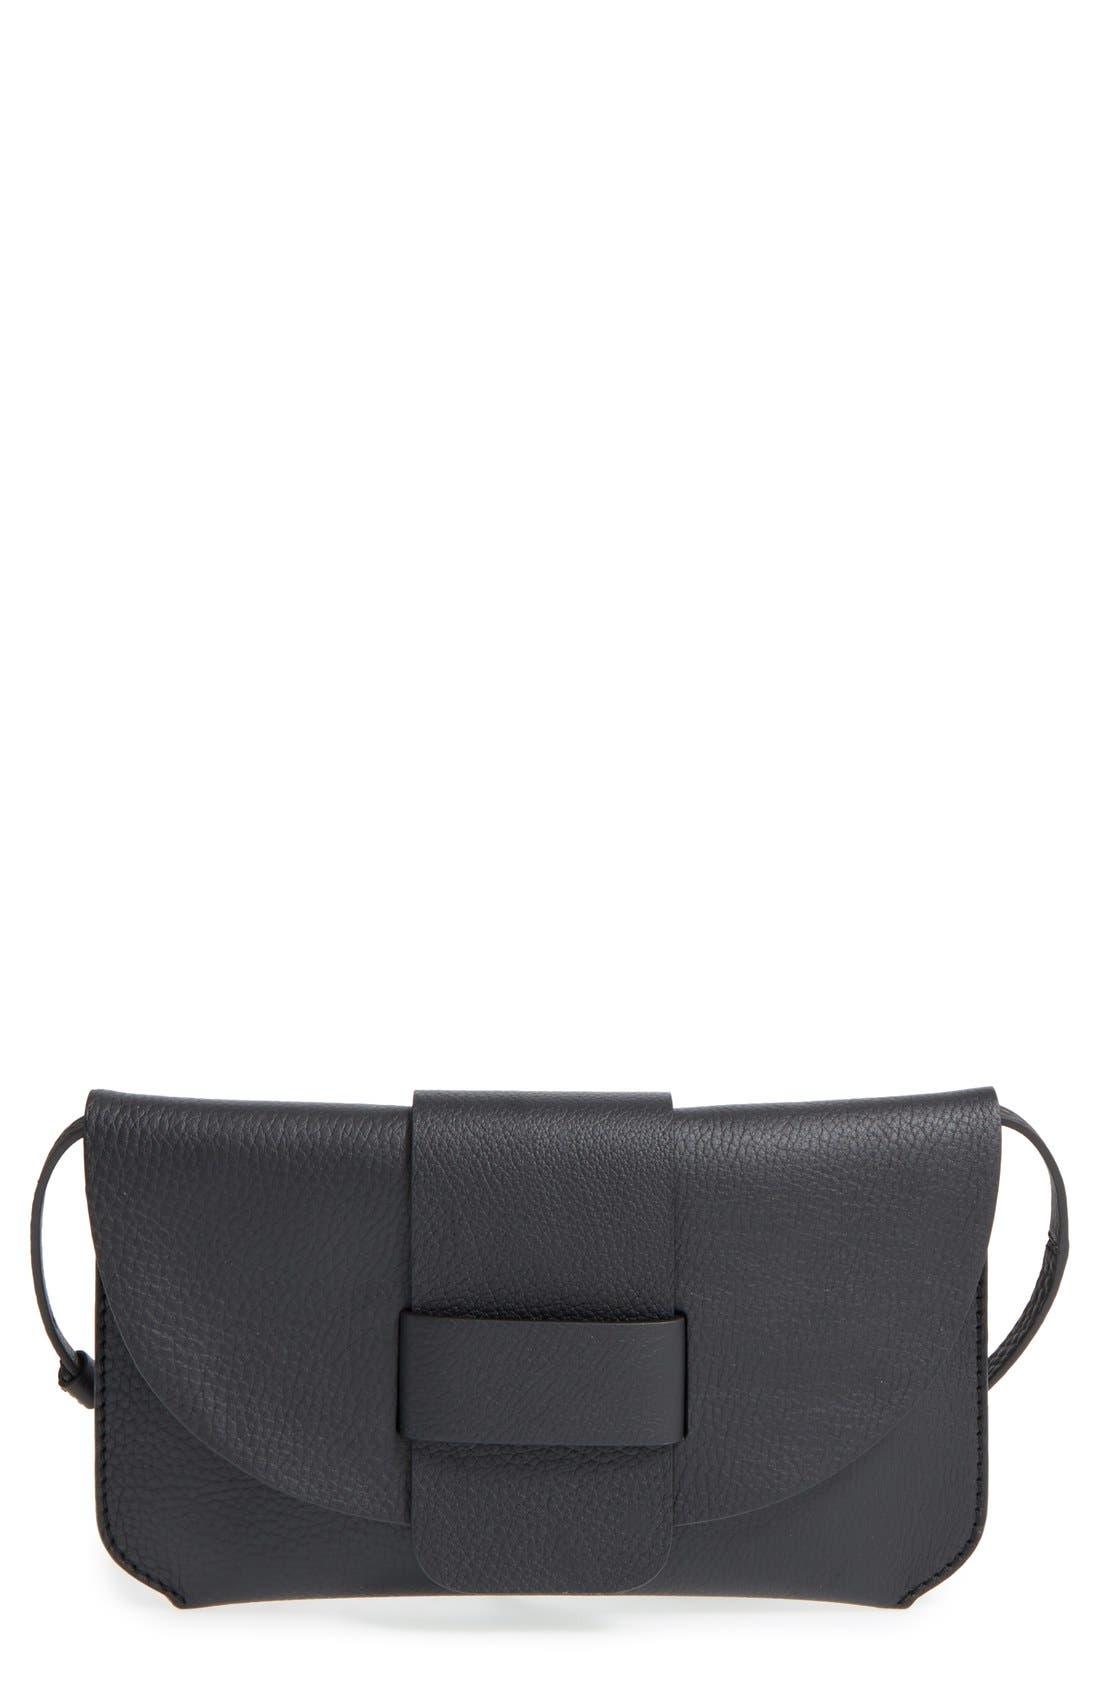 Pedro Garcia Leather Flap Clutch